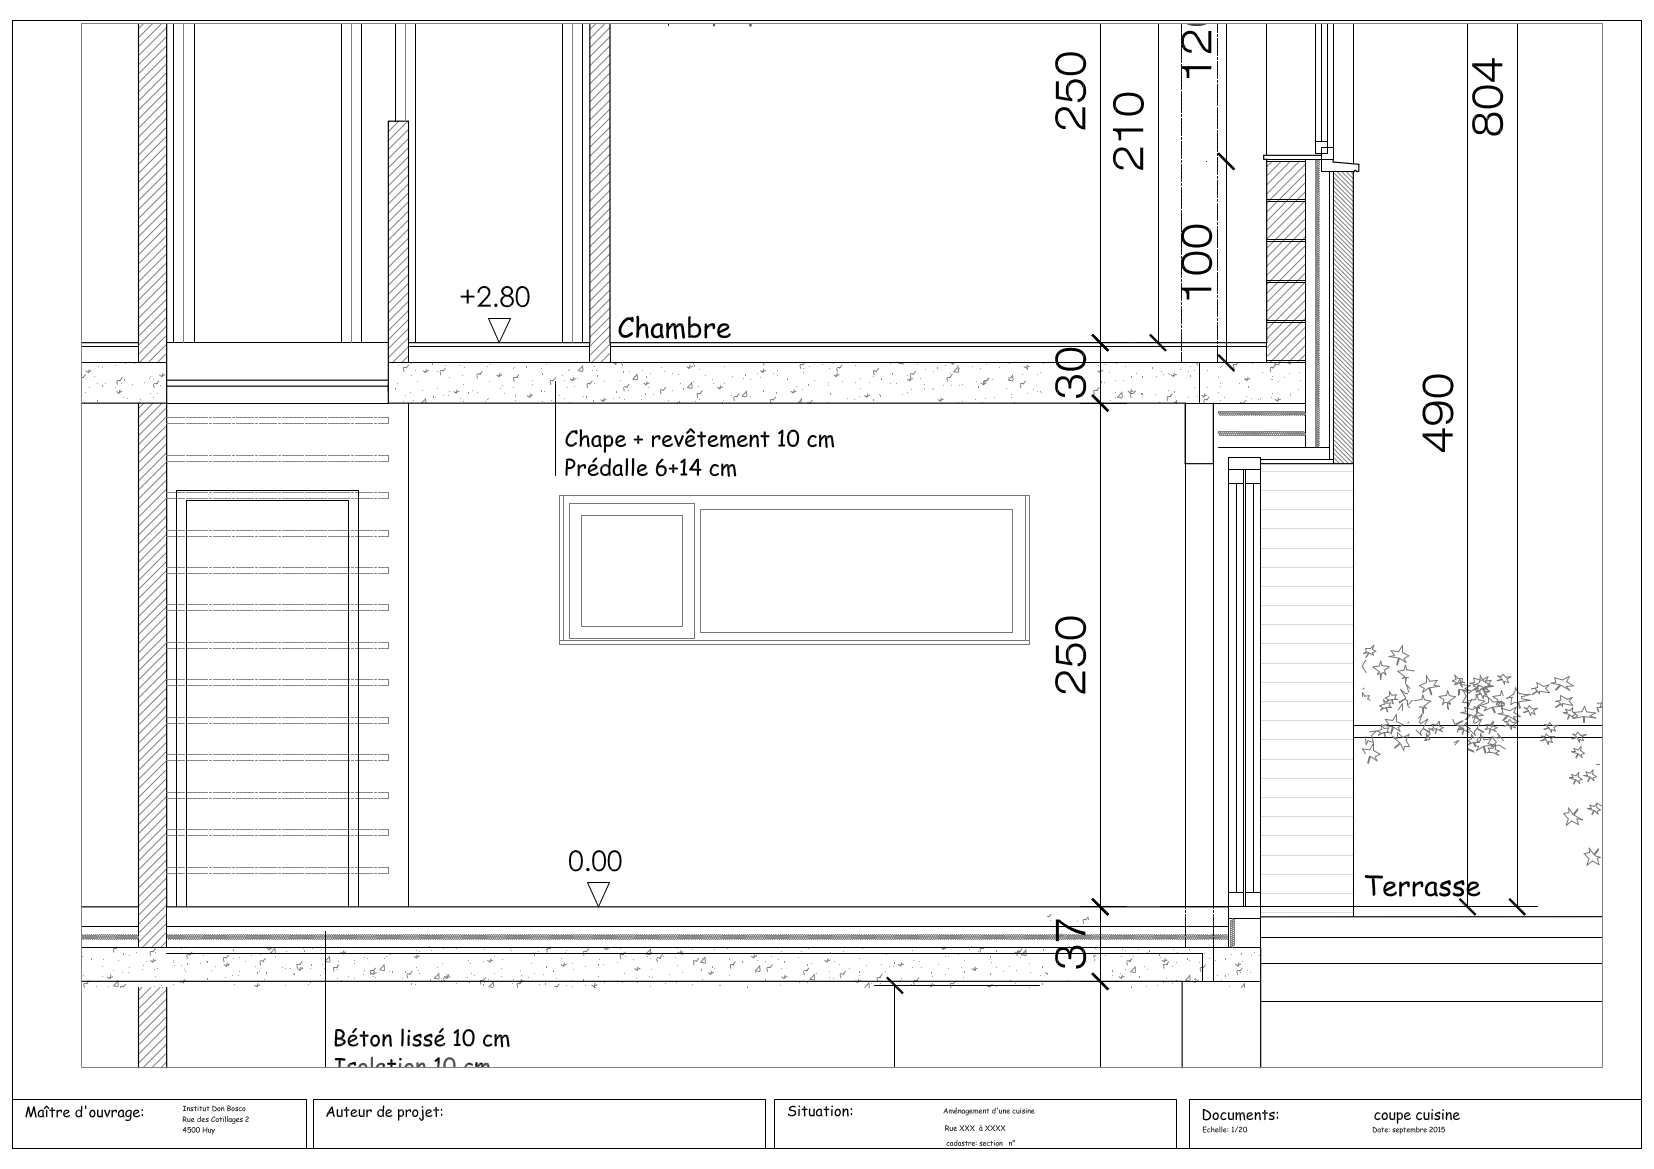 coupe cuisine 2 thibault florkin artisan menuisier. Black Bedroom Furniture Sets. Home Design Ideas